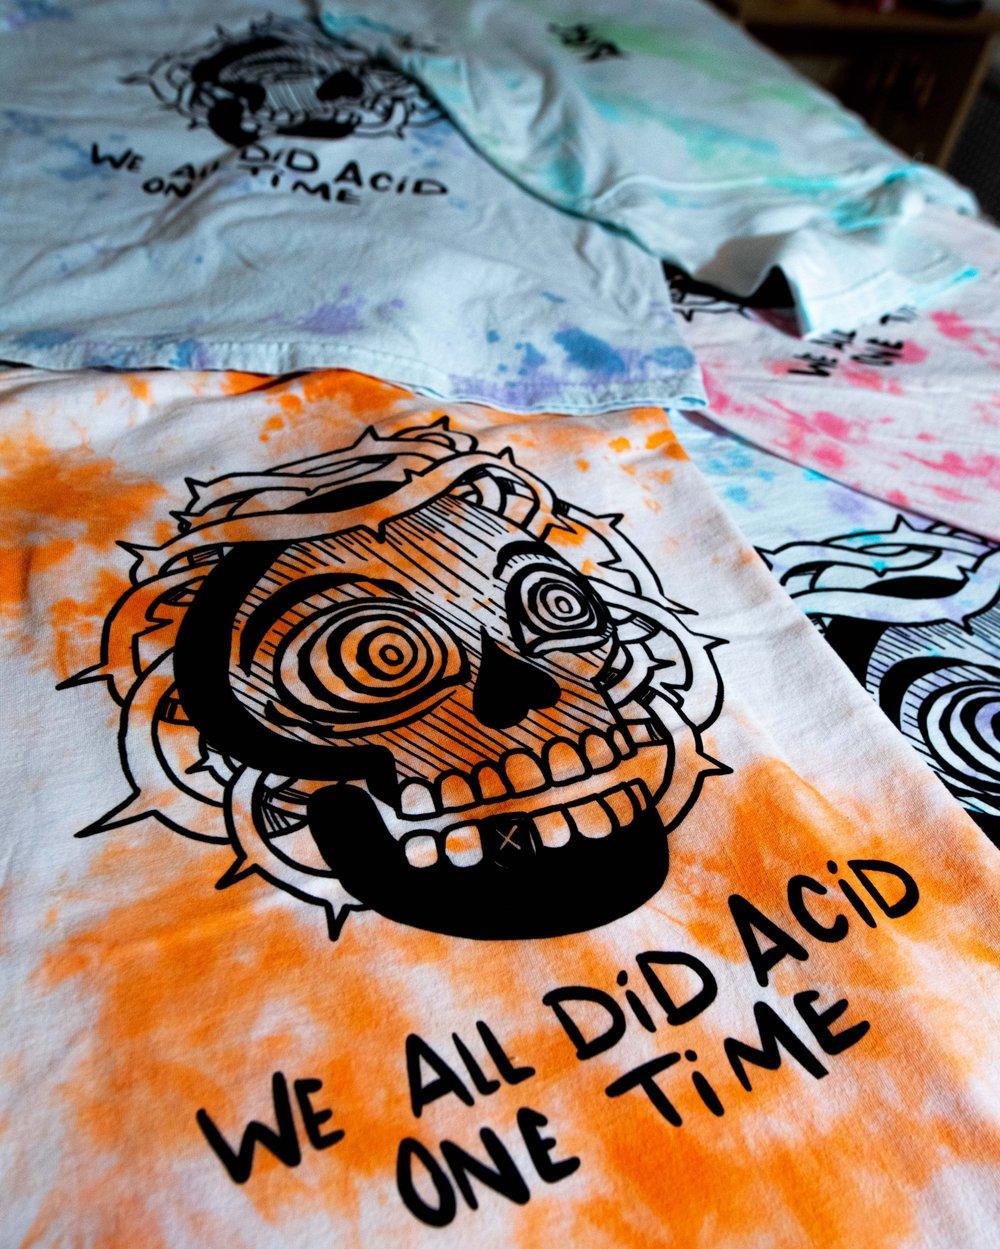 Acidddddd